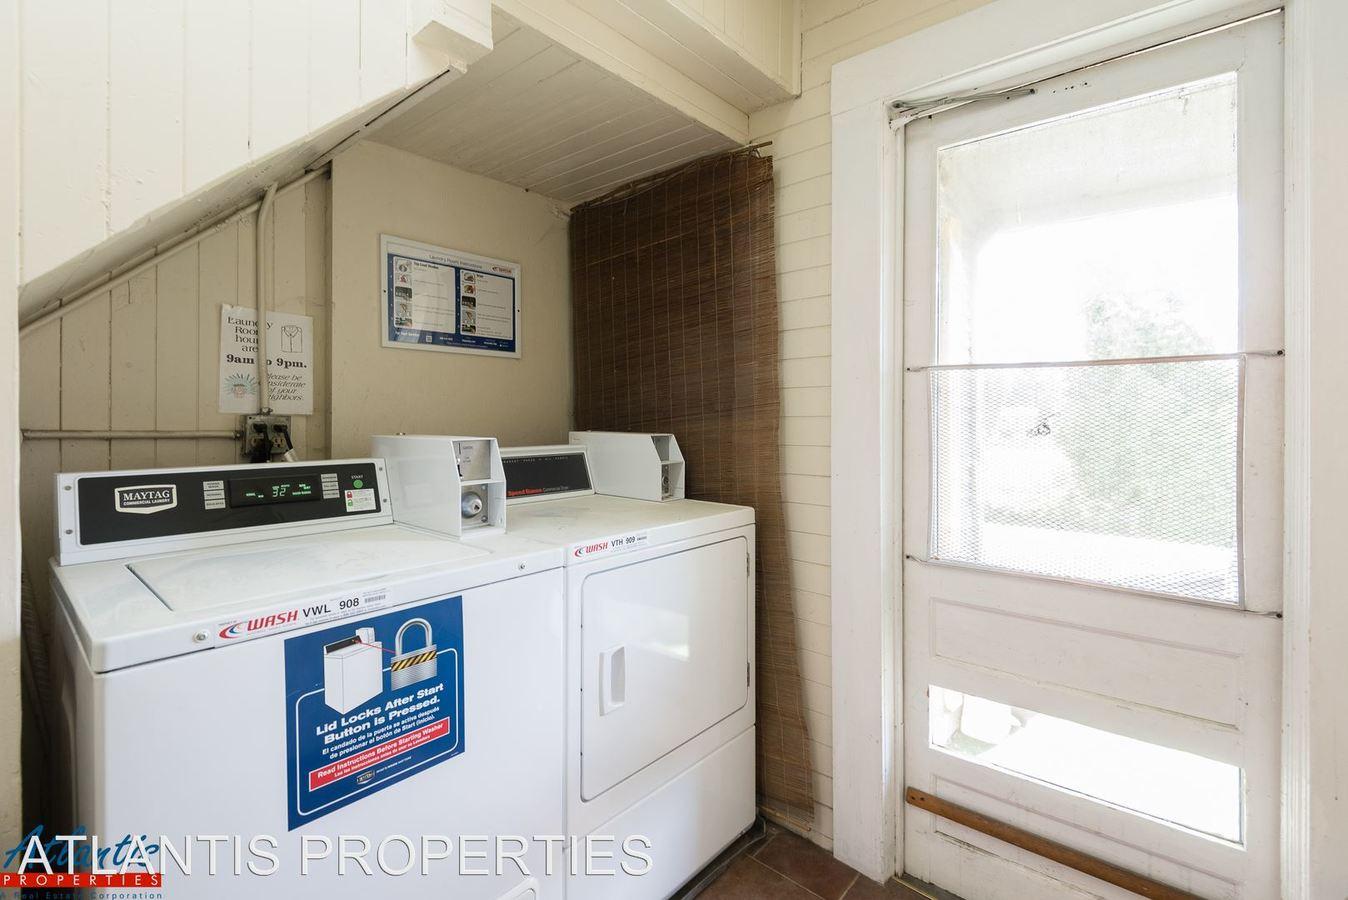 2 Bedrooms 1 Bathroom Apartment for rent at 170 E. William Street in San Jose, CA